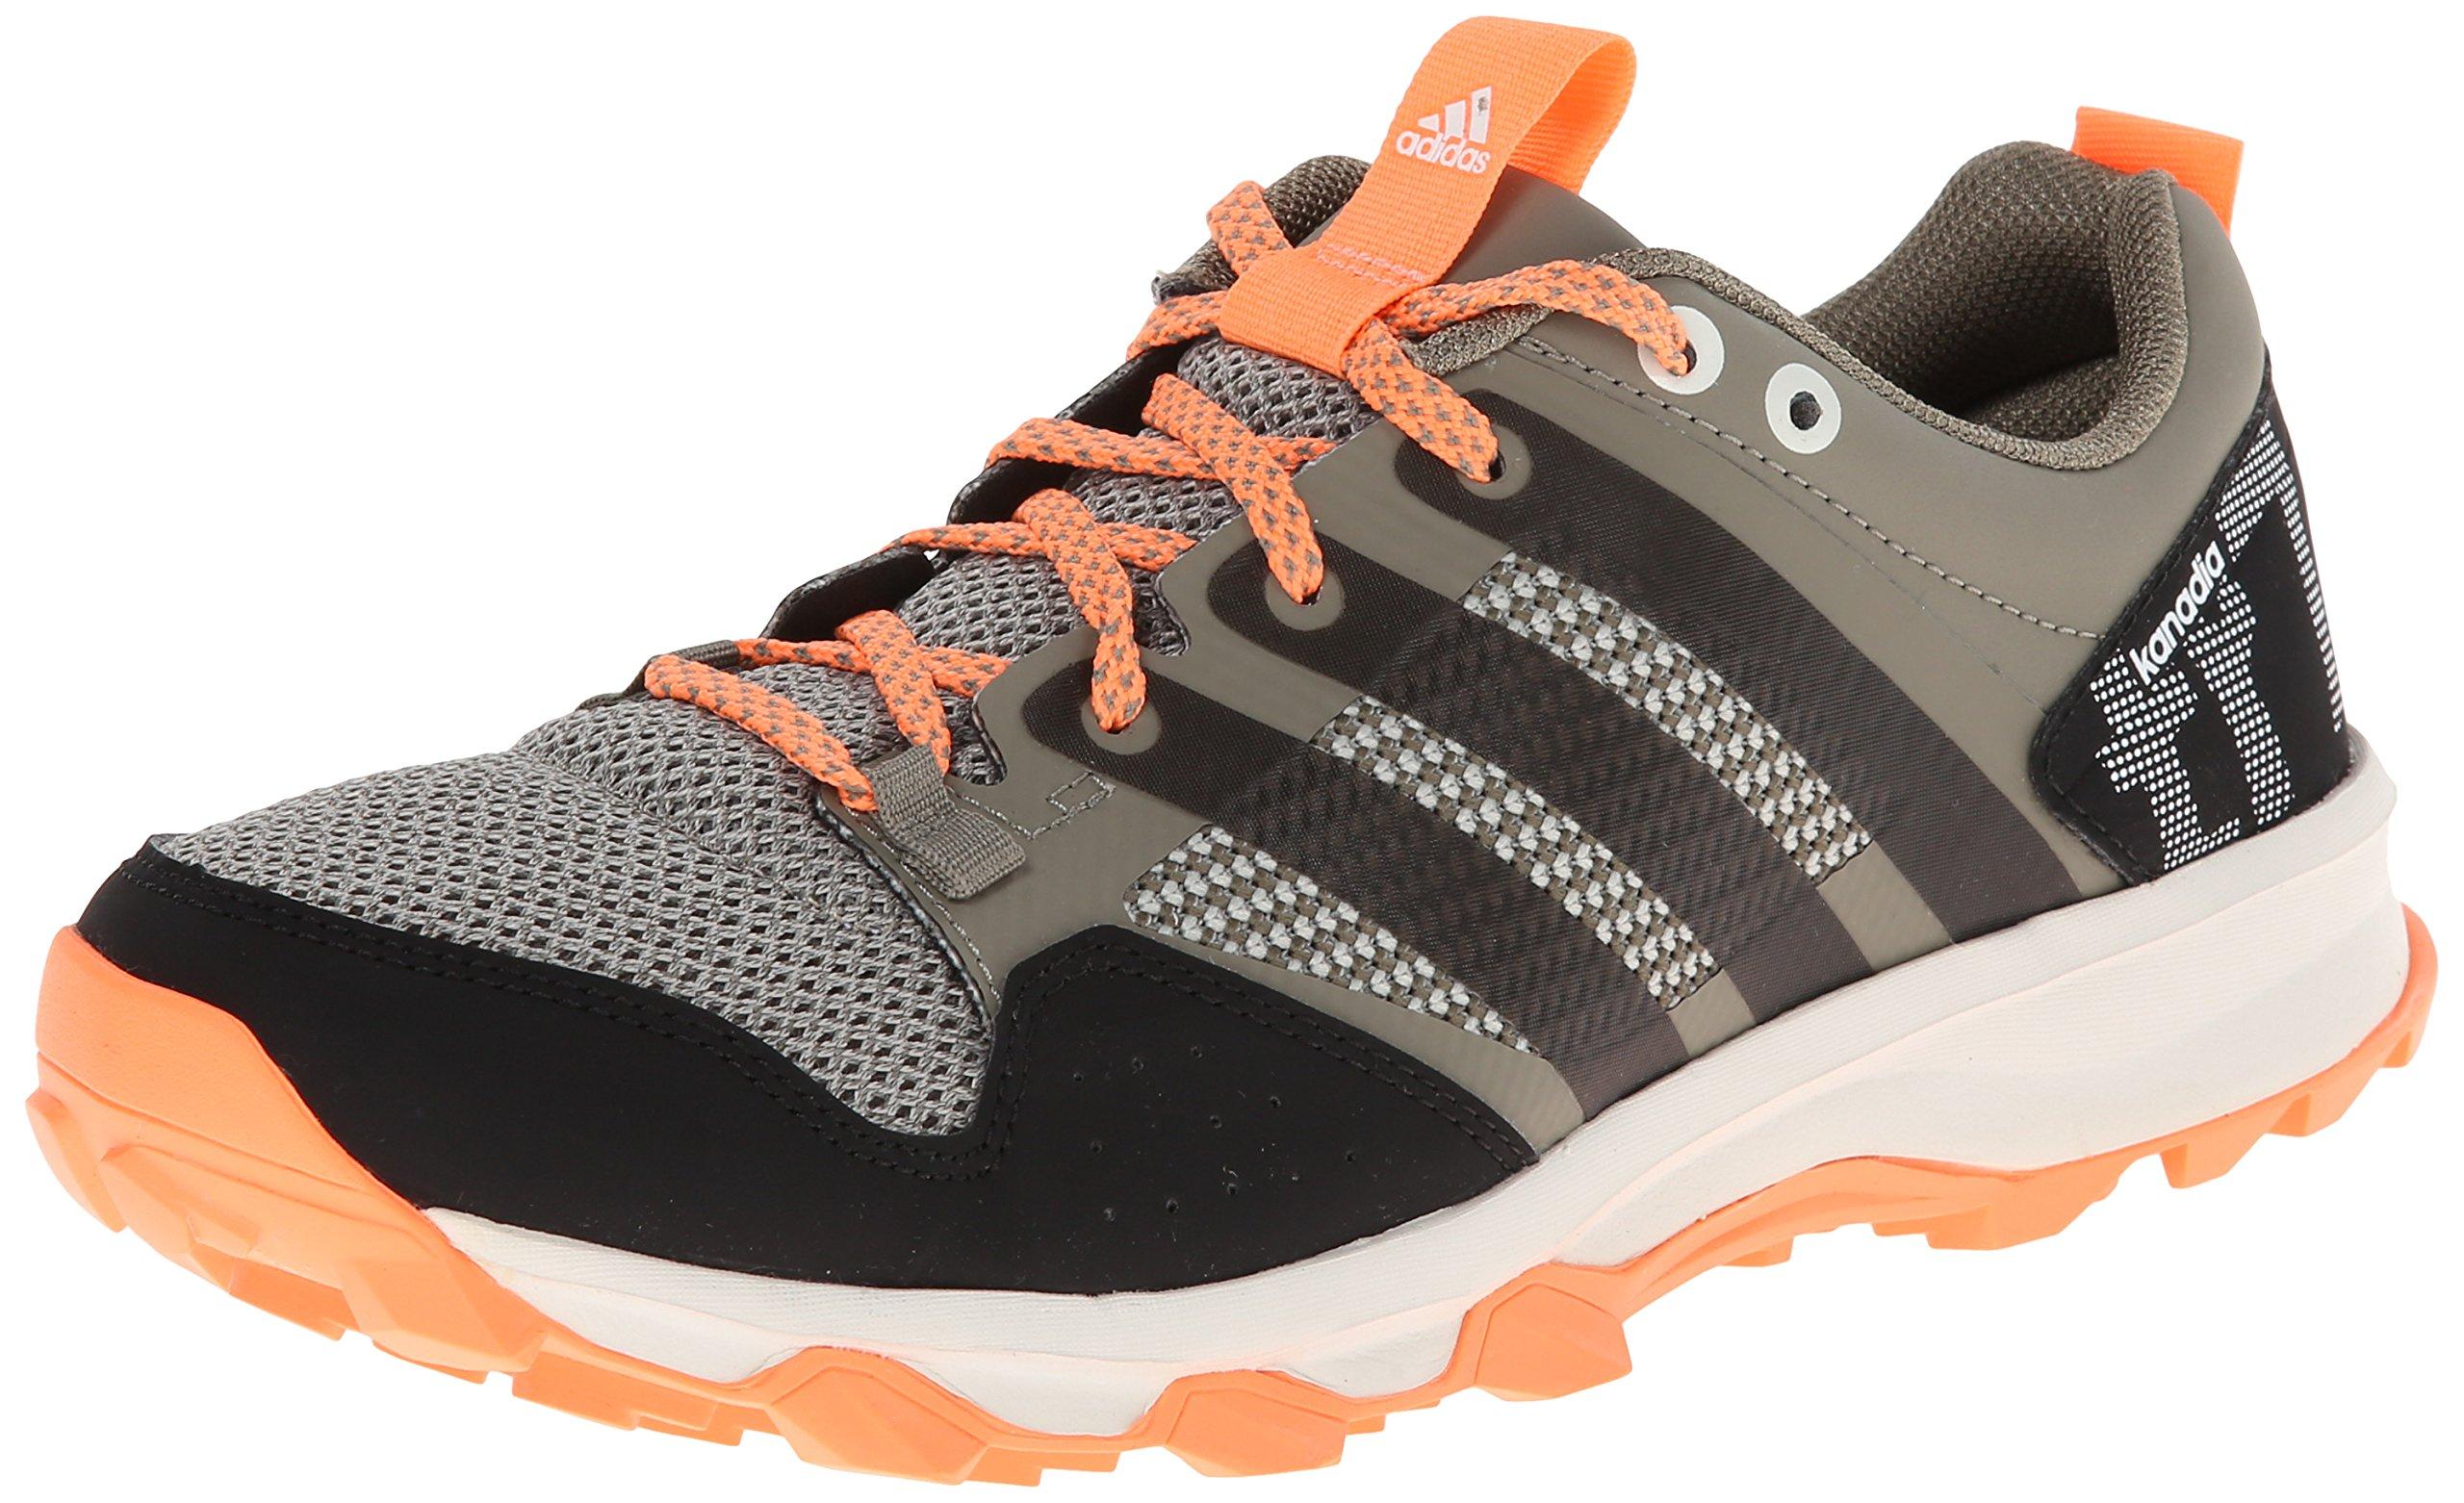 adidas Performance Women's Kanadia 7 TR W Trail Running Shoe, Clay/Chalk/Flash Orange, 7 M US by adidas (Image #1)